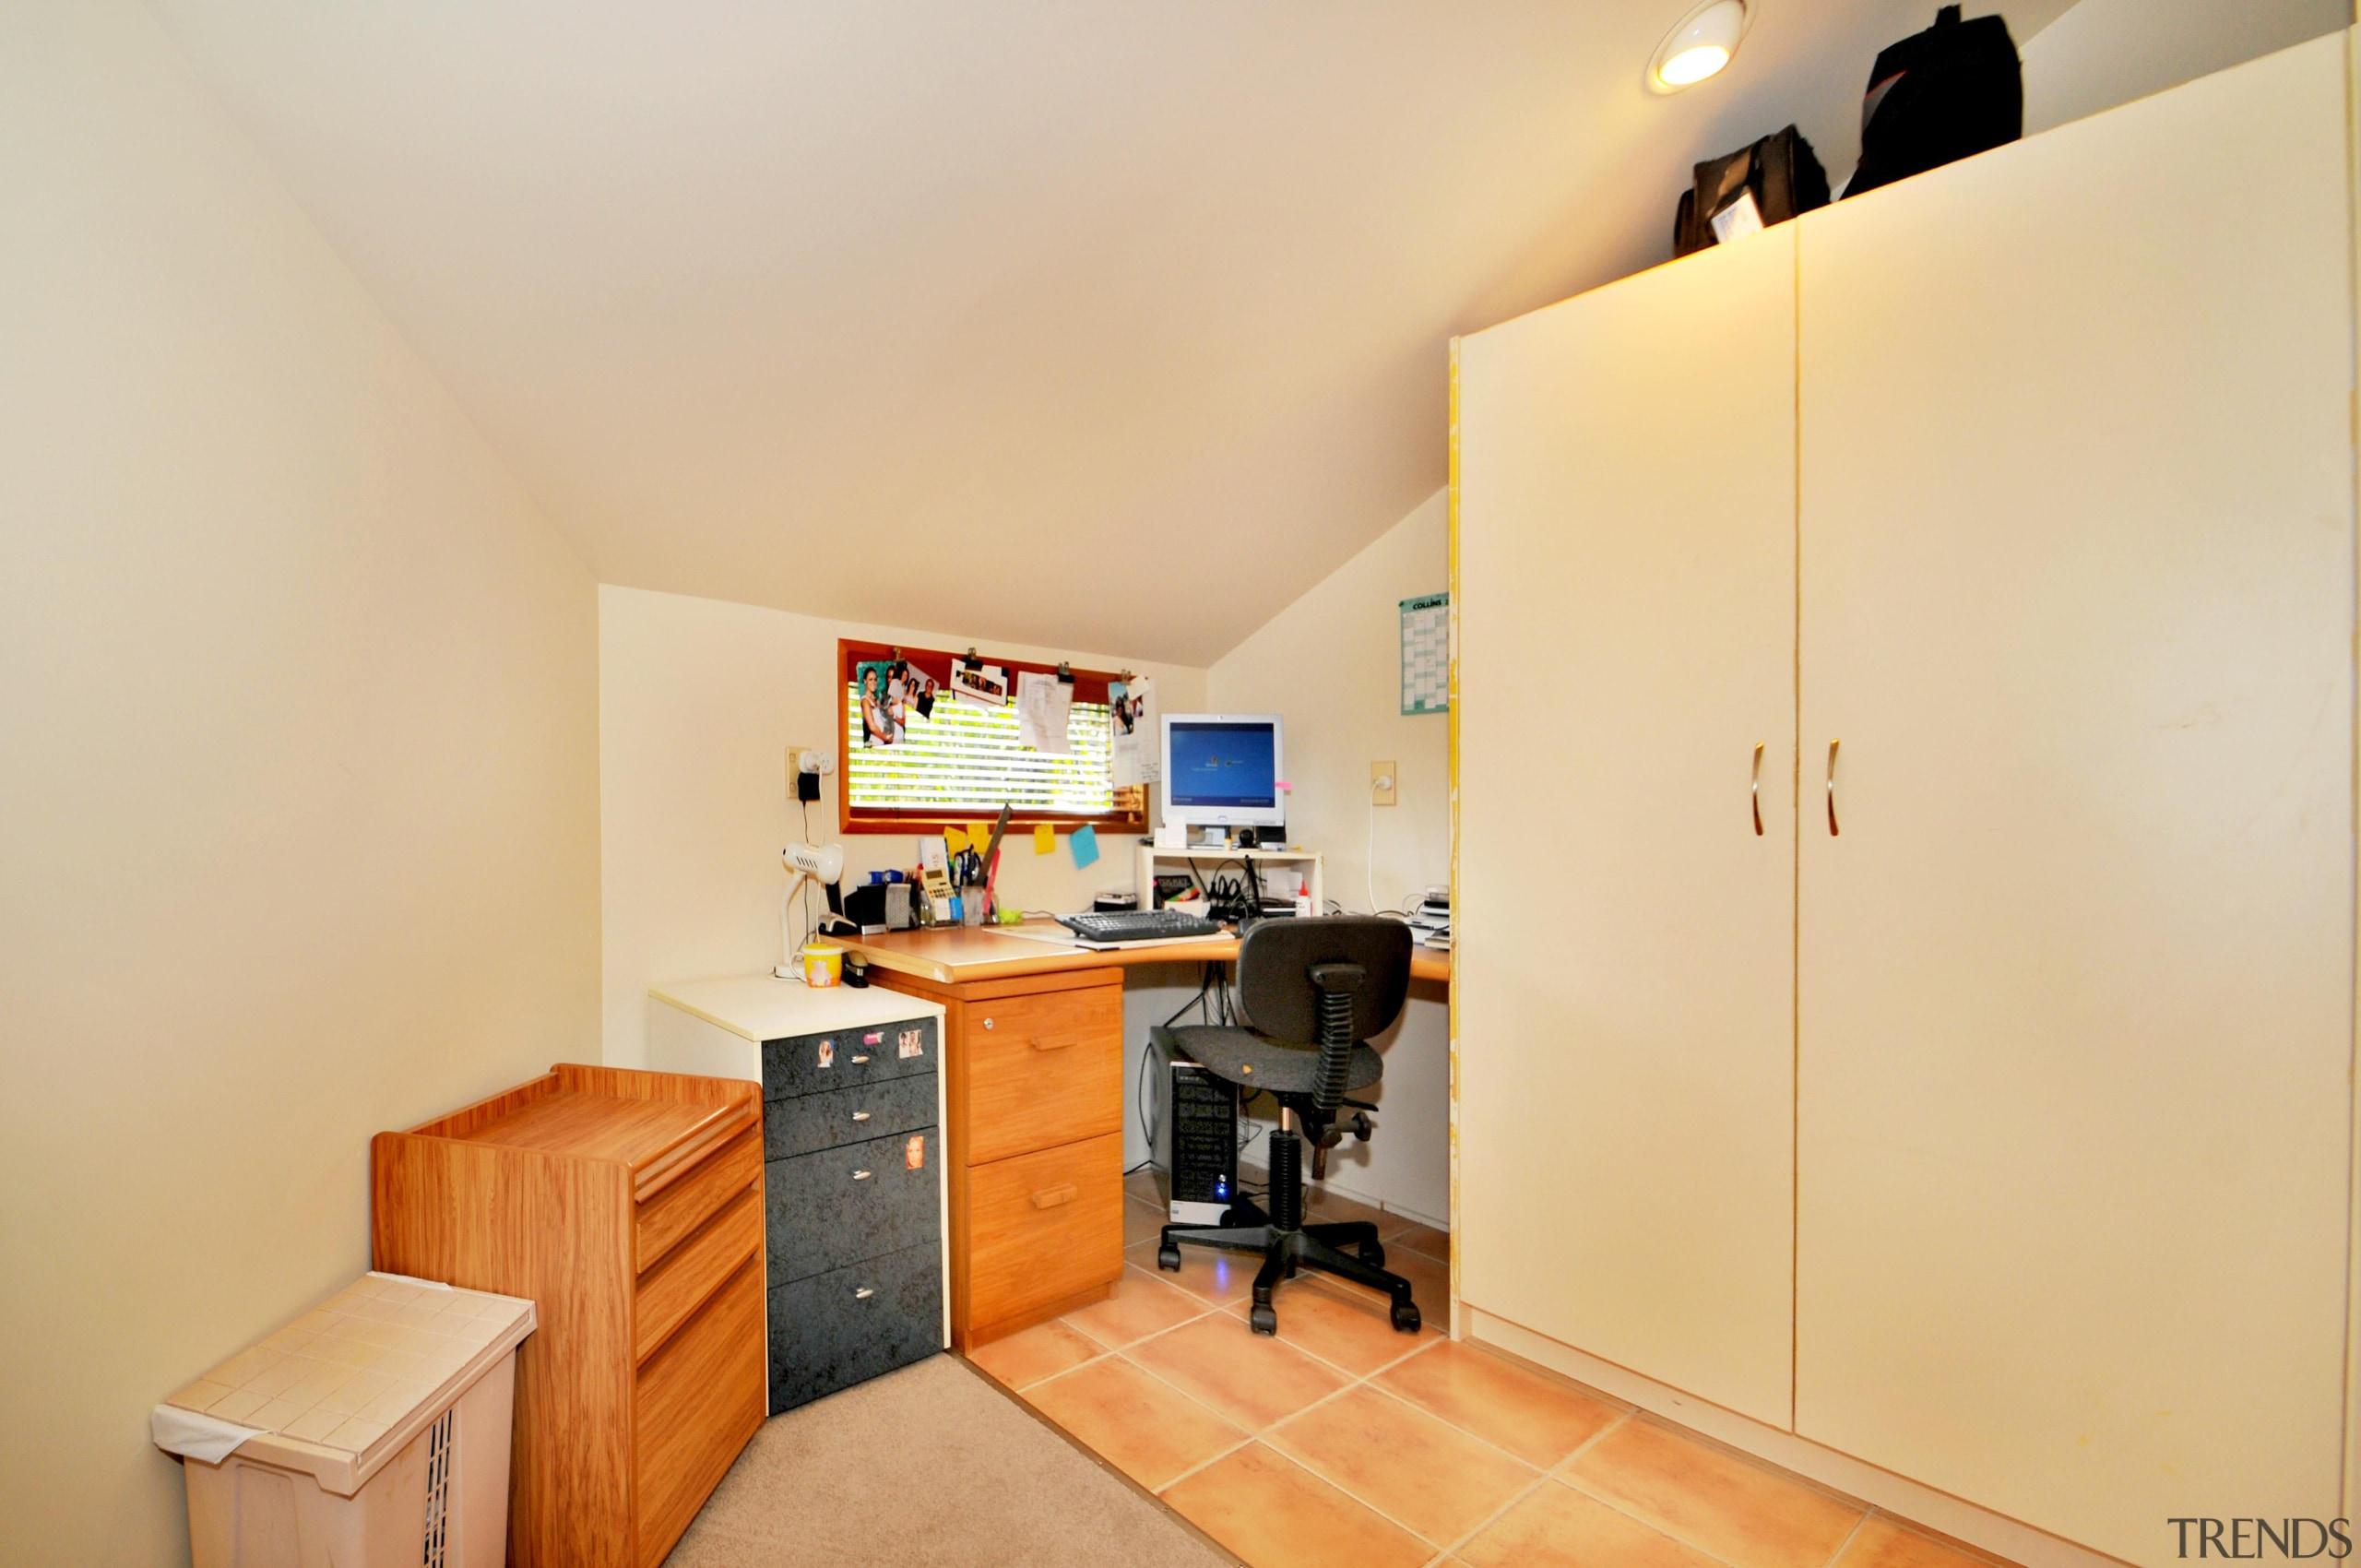 Office - home | interior design | property home, interior design, property, real estate, room, orange